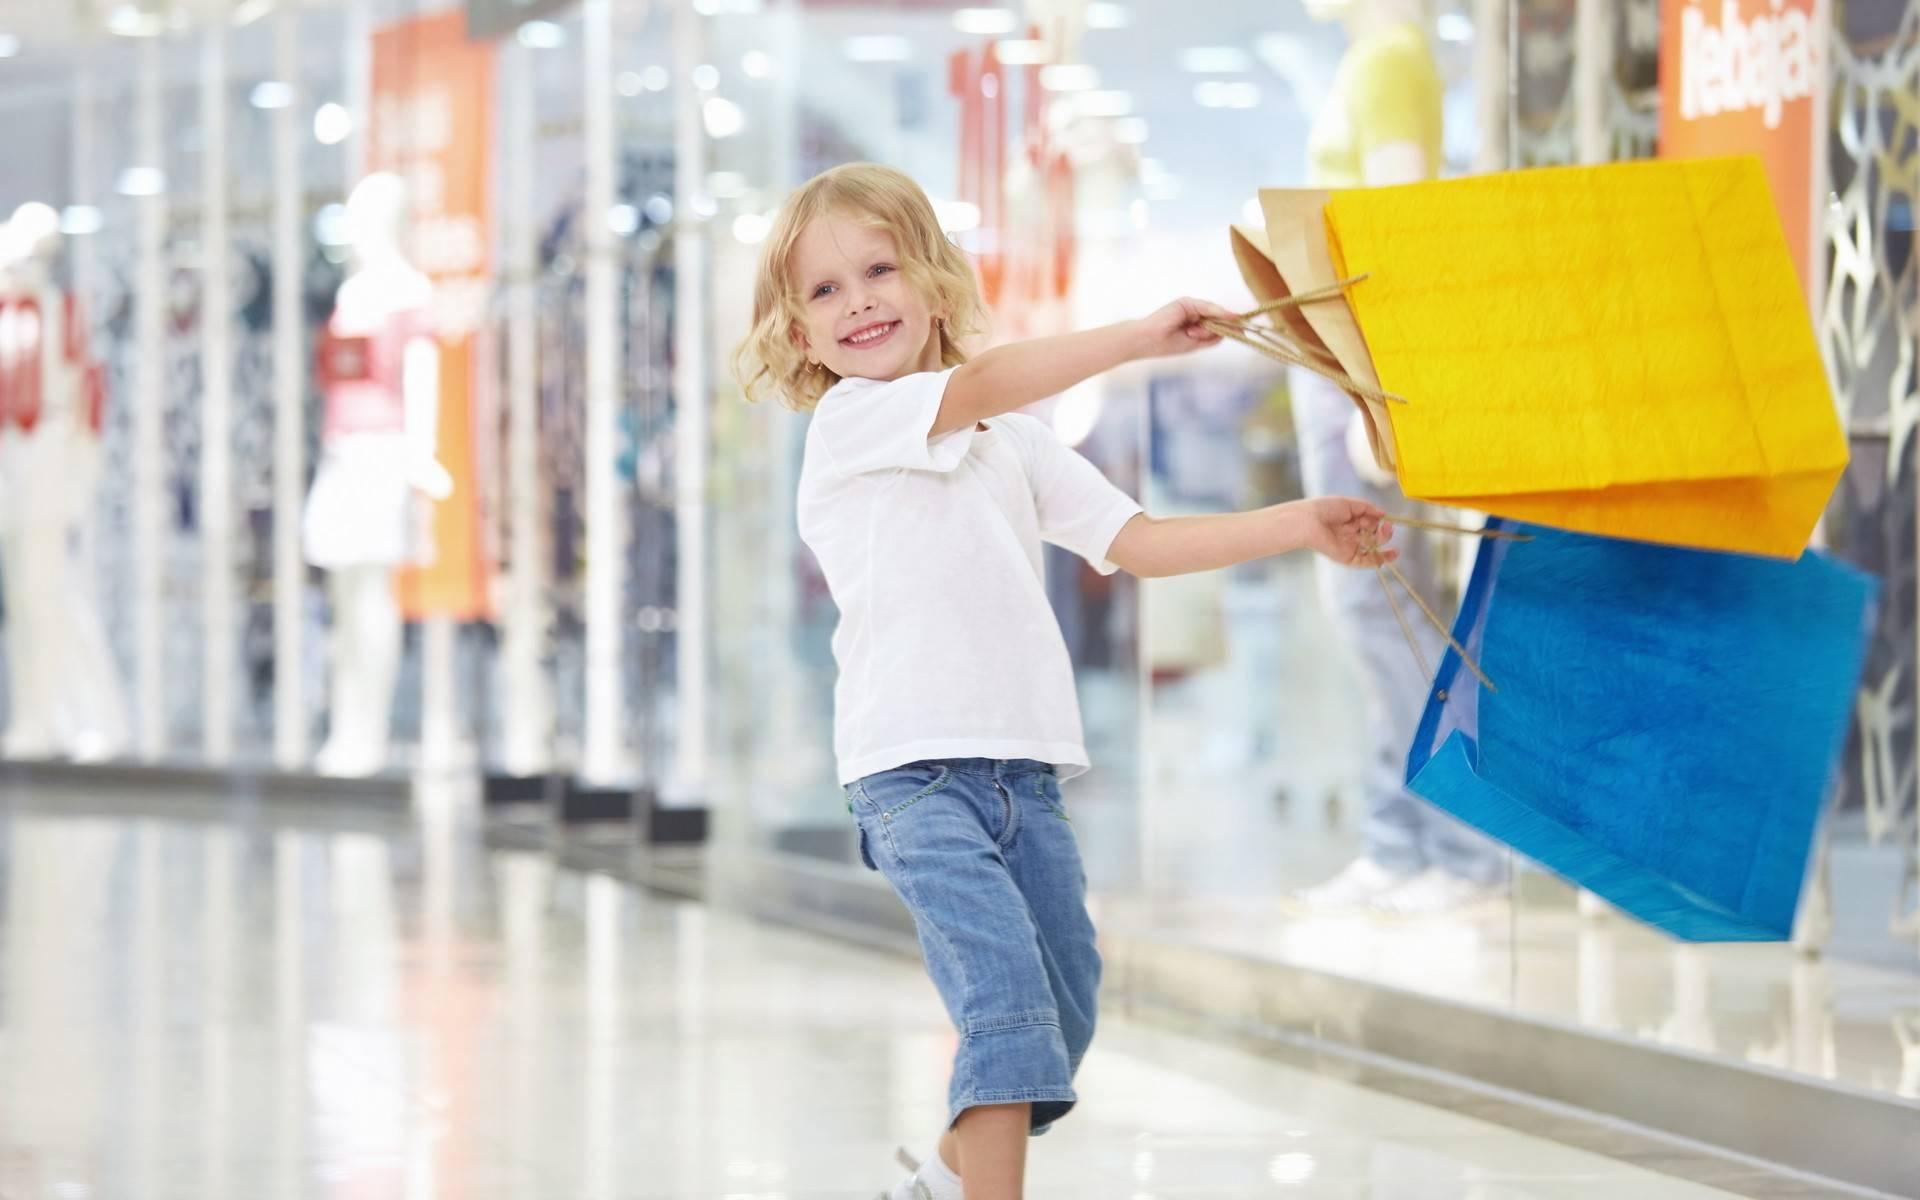 1444821275_kids-shopping-1920x1200-wallpaper-1674572.jpg